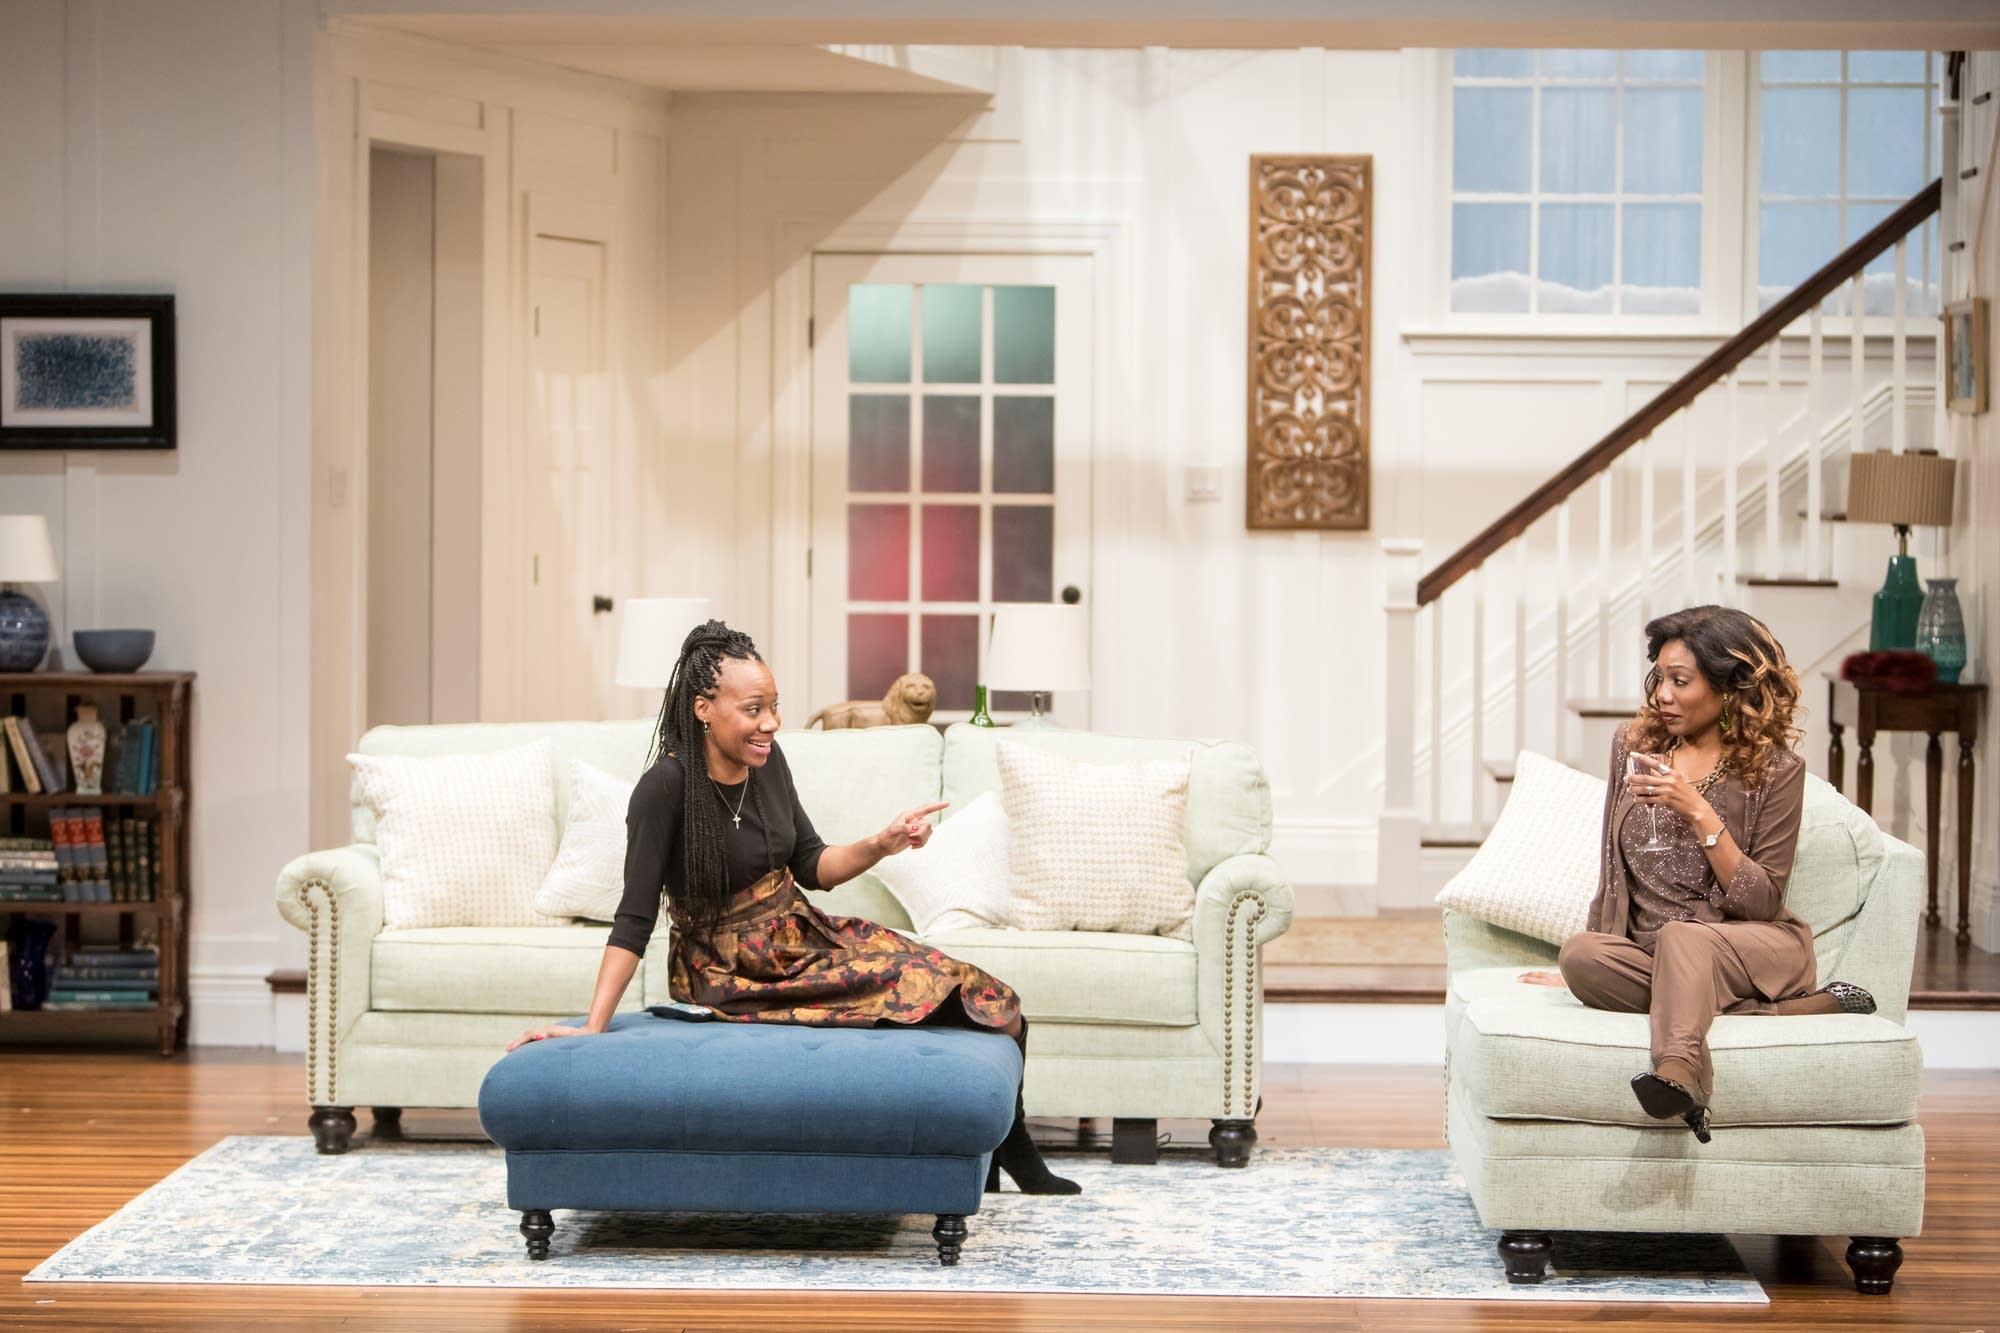 Sha Cage and Austene Van play members of a Zimbabwean-American family.